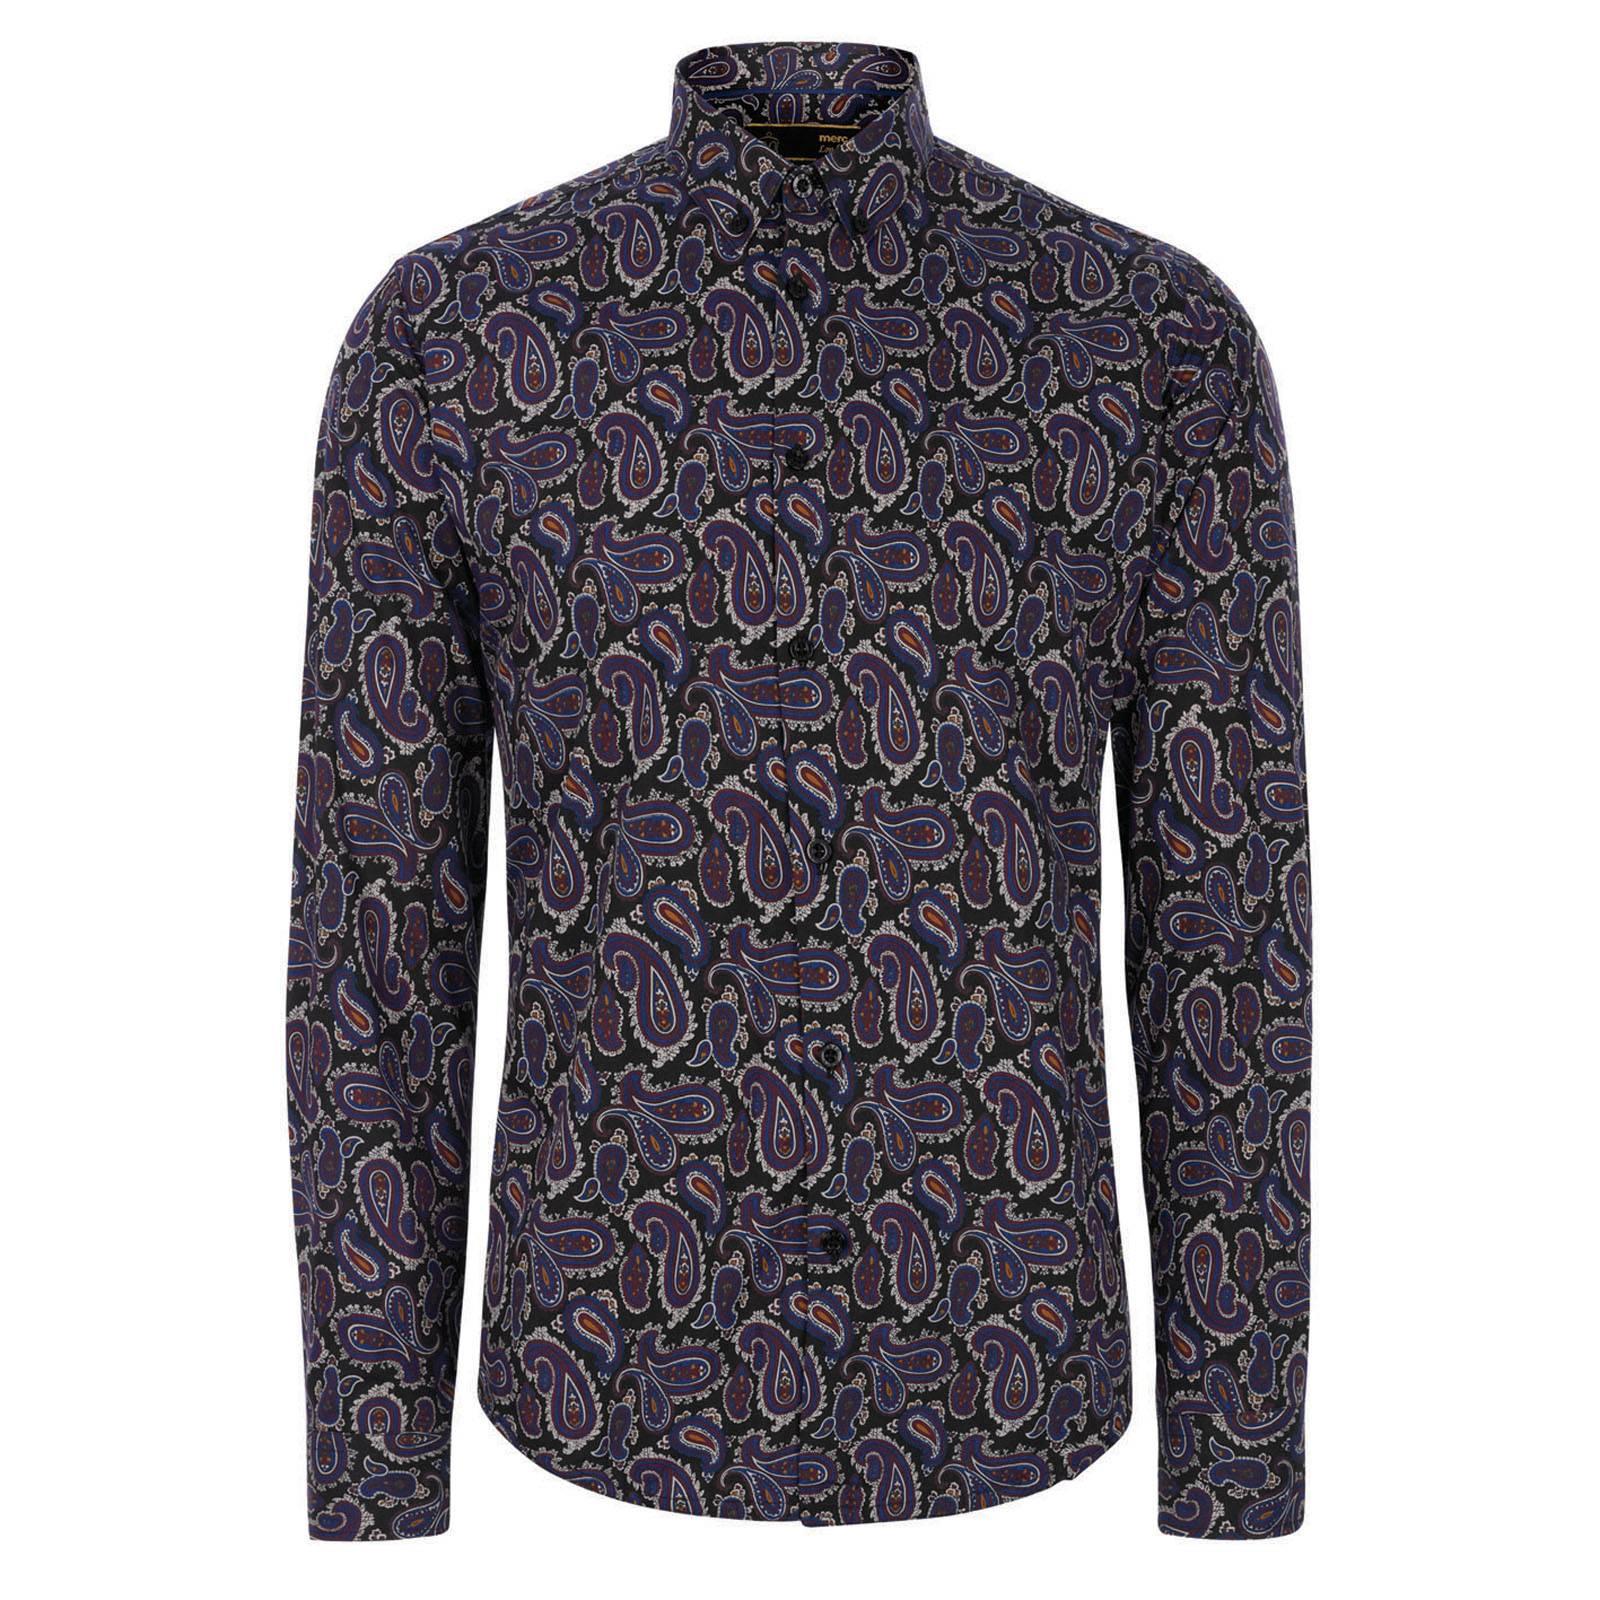 Рубашка ElkinsРубашки<br><br><br>Артикул: 1513210<br>Материал: 100% хлопок<br>Цвет: синий<br>Пол: Мужской